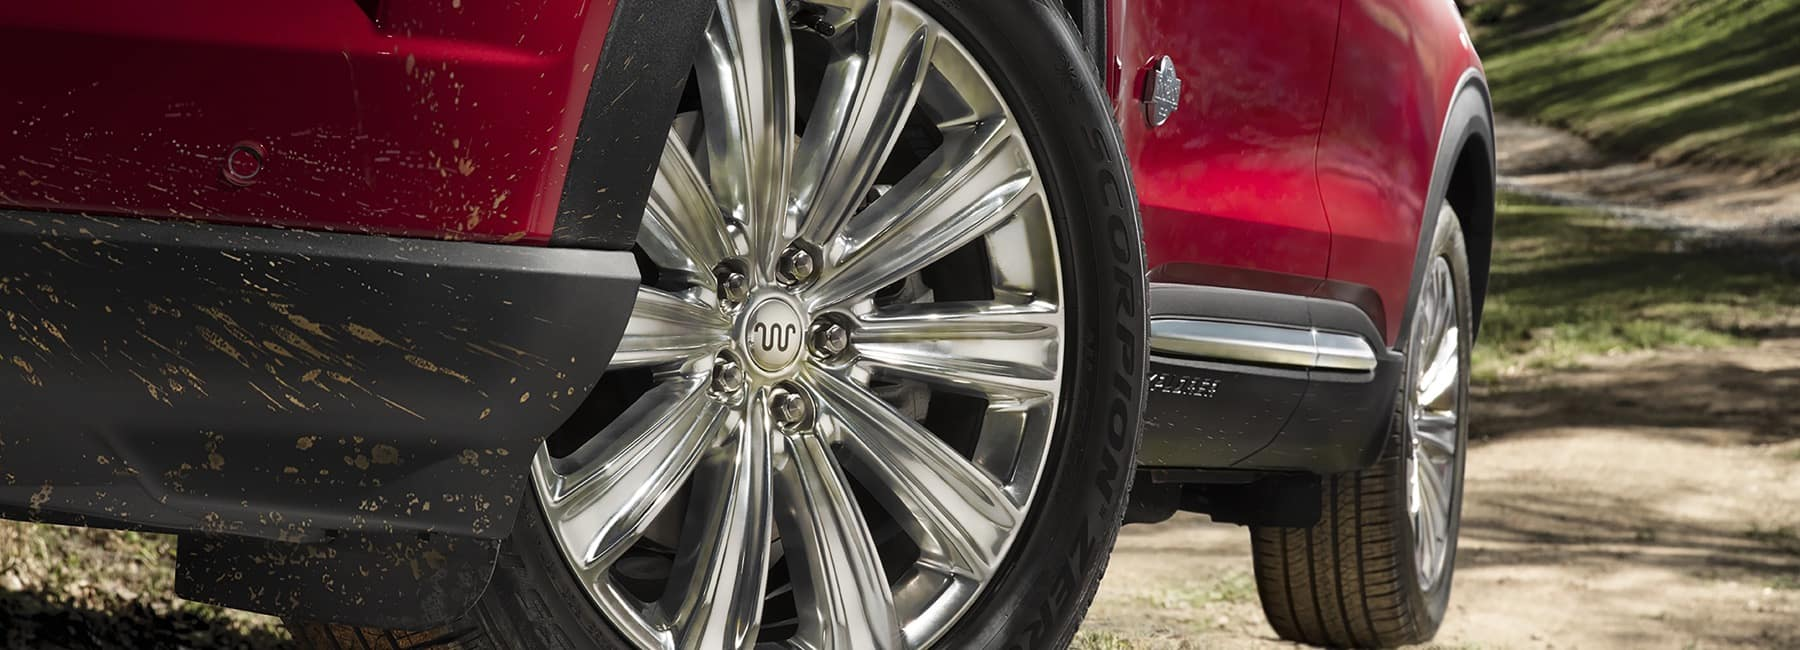 Closeup of a 20 inch Ten Spoke Aluminum Wheel on a 2021 Ford Explorer King Ranch